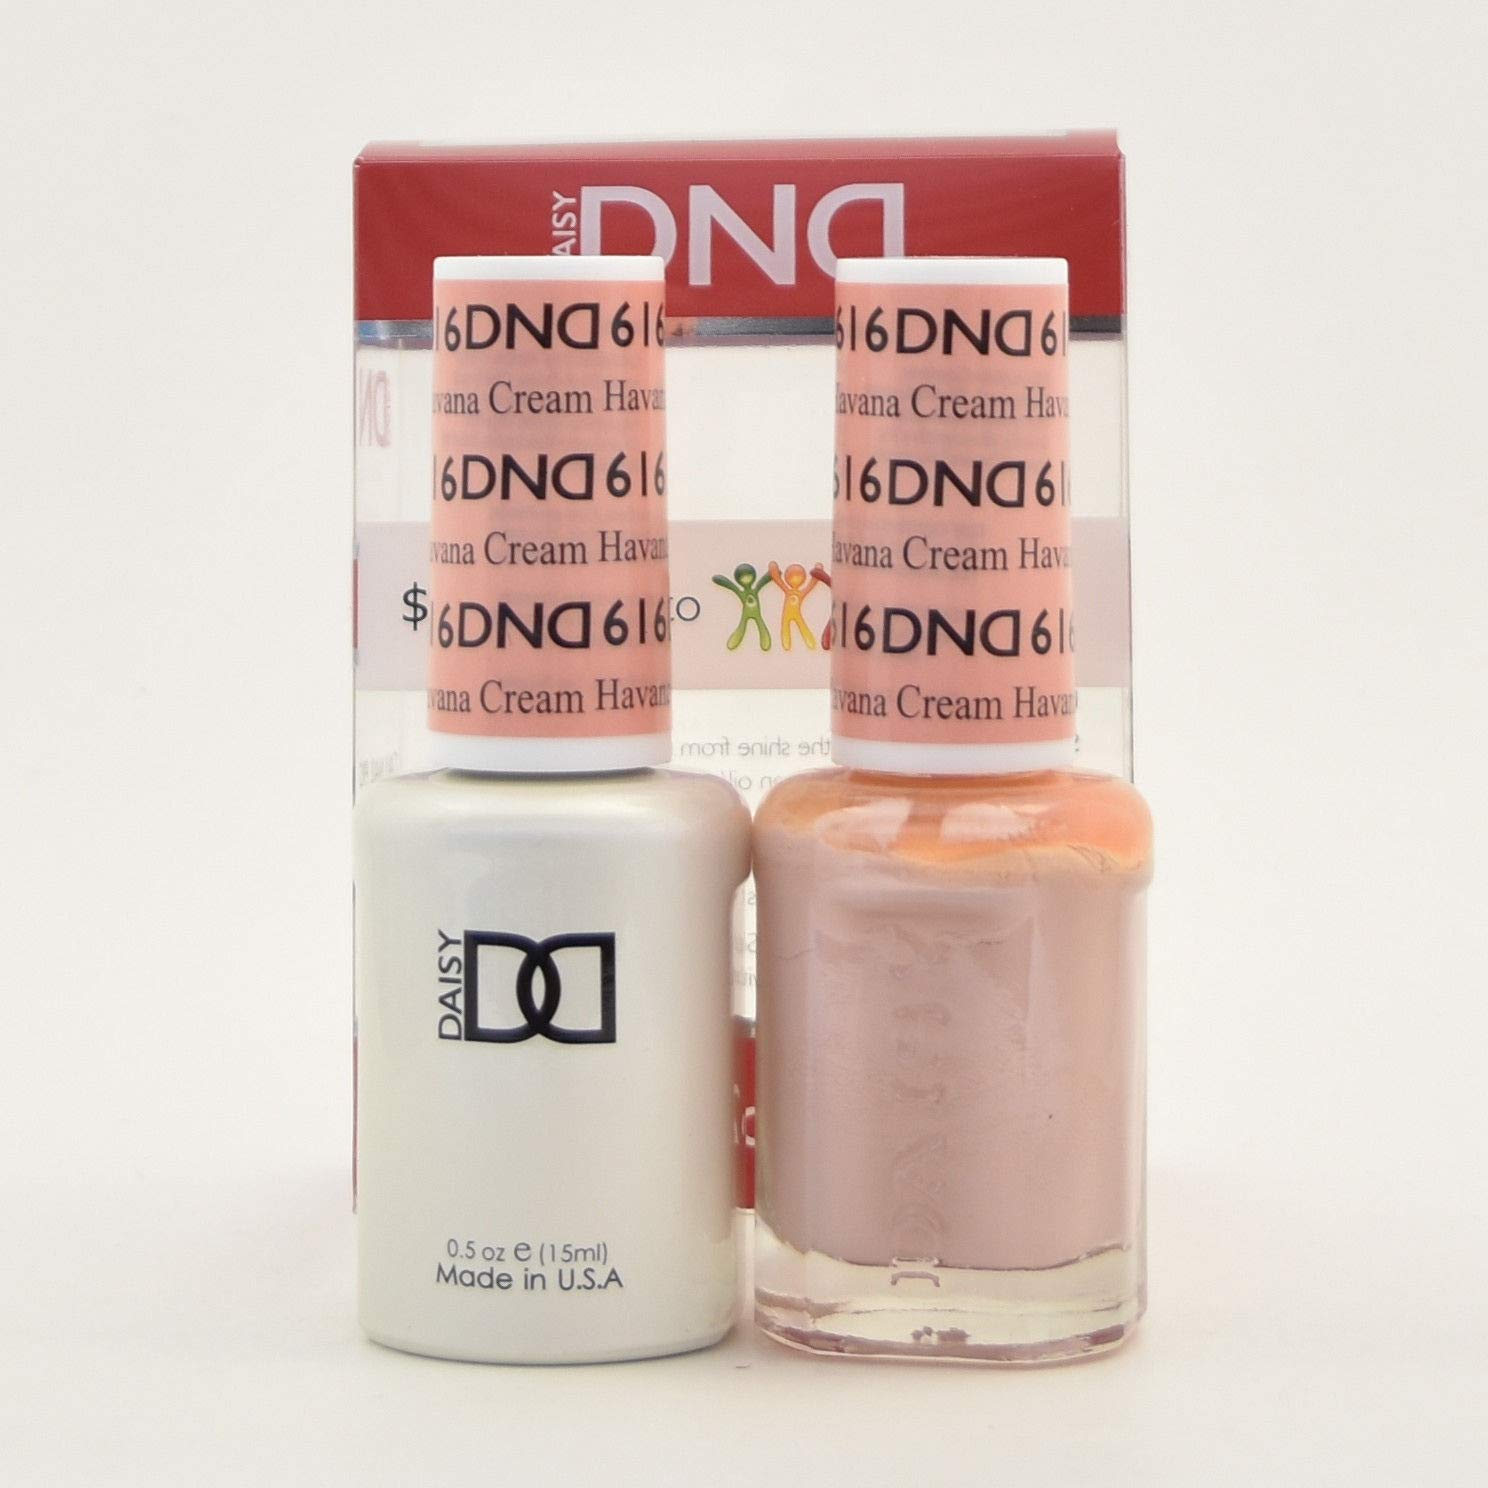 DND Daisy Gel Duo | Universal Nail Supplies